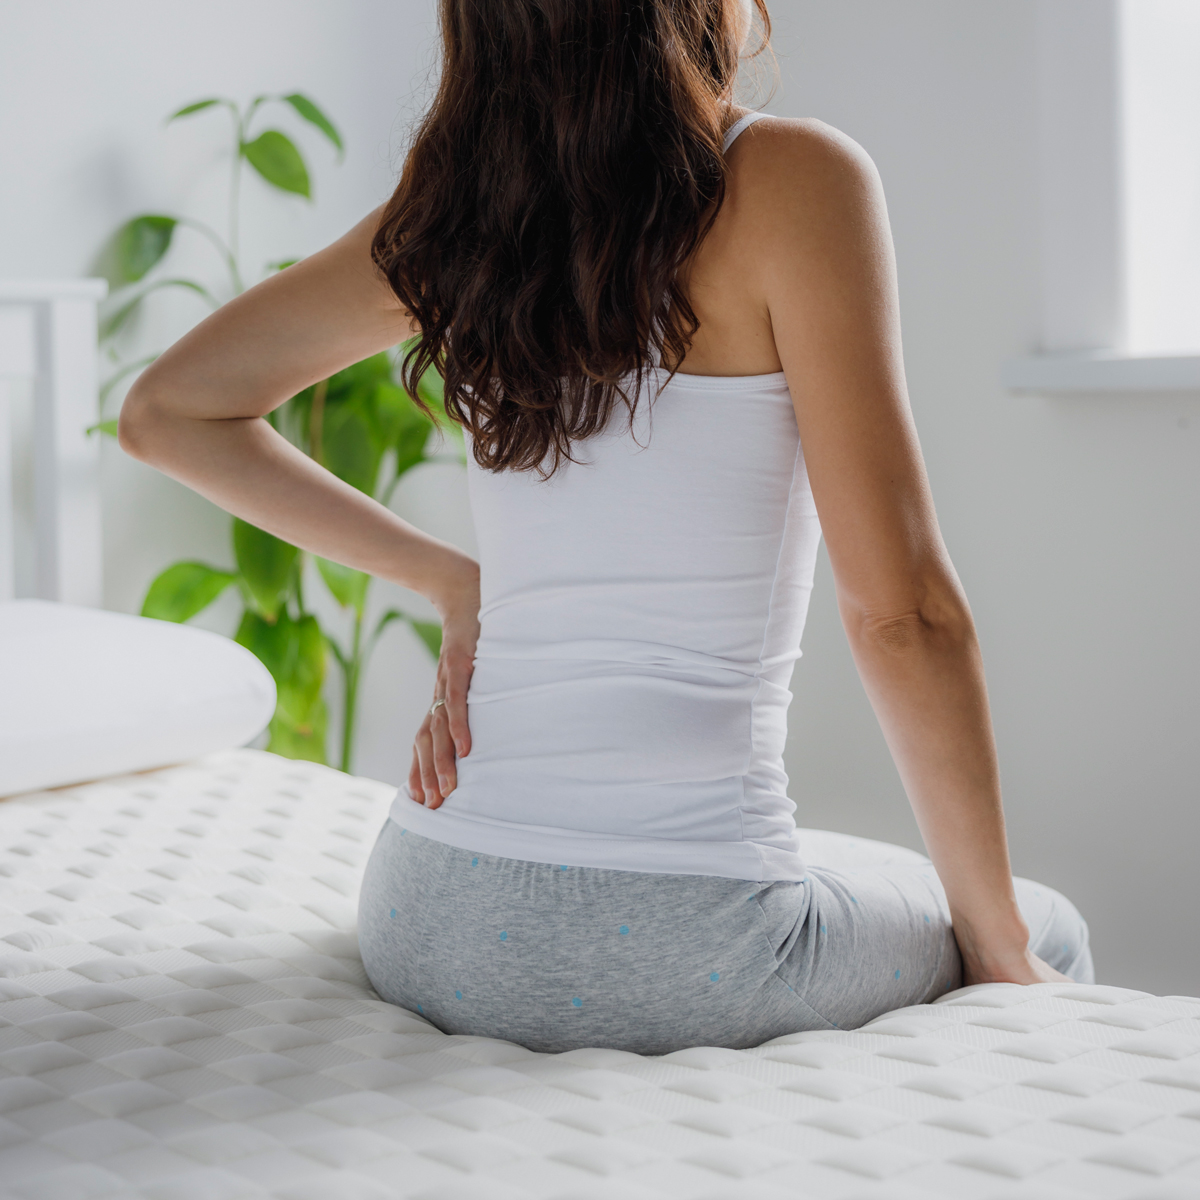 woman sitting on a levitex mattress